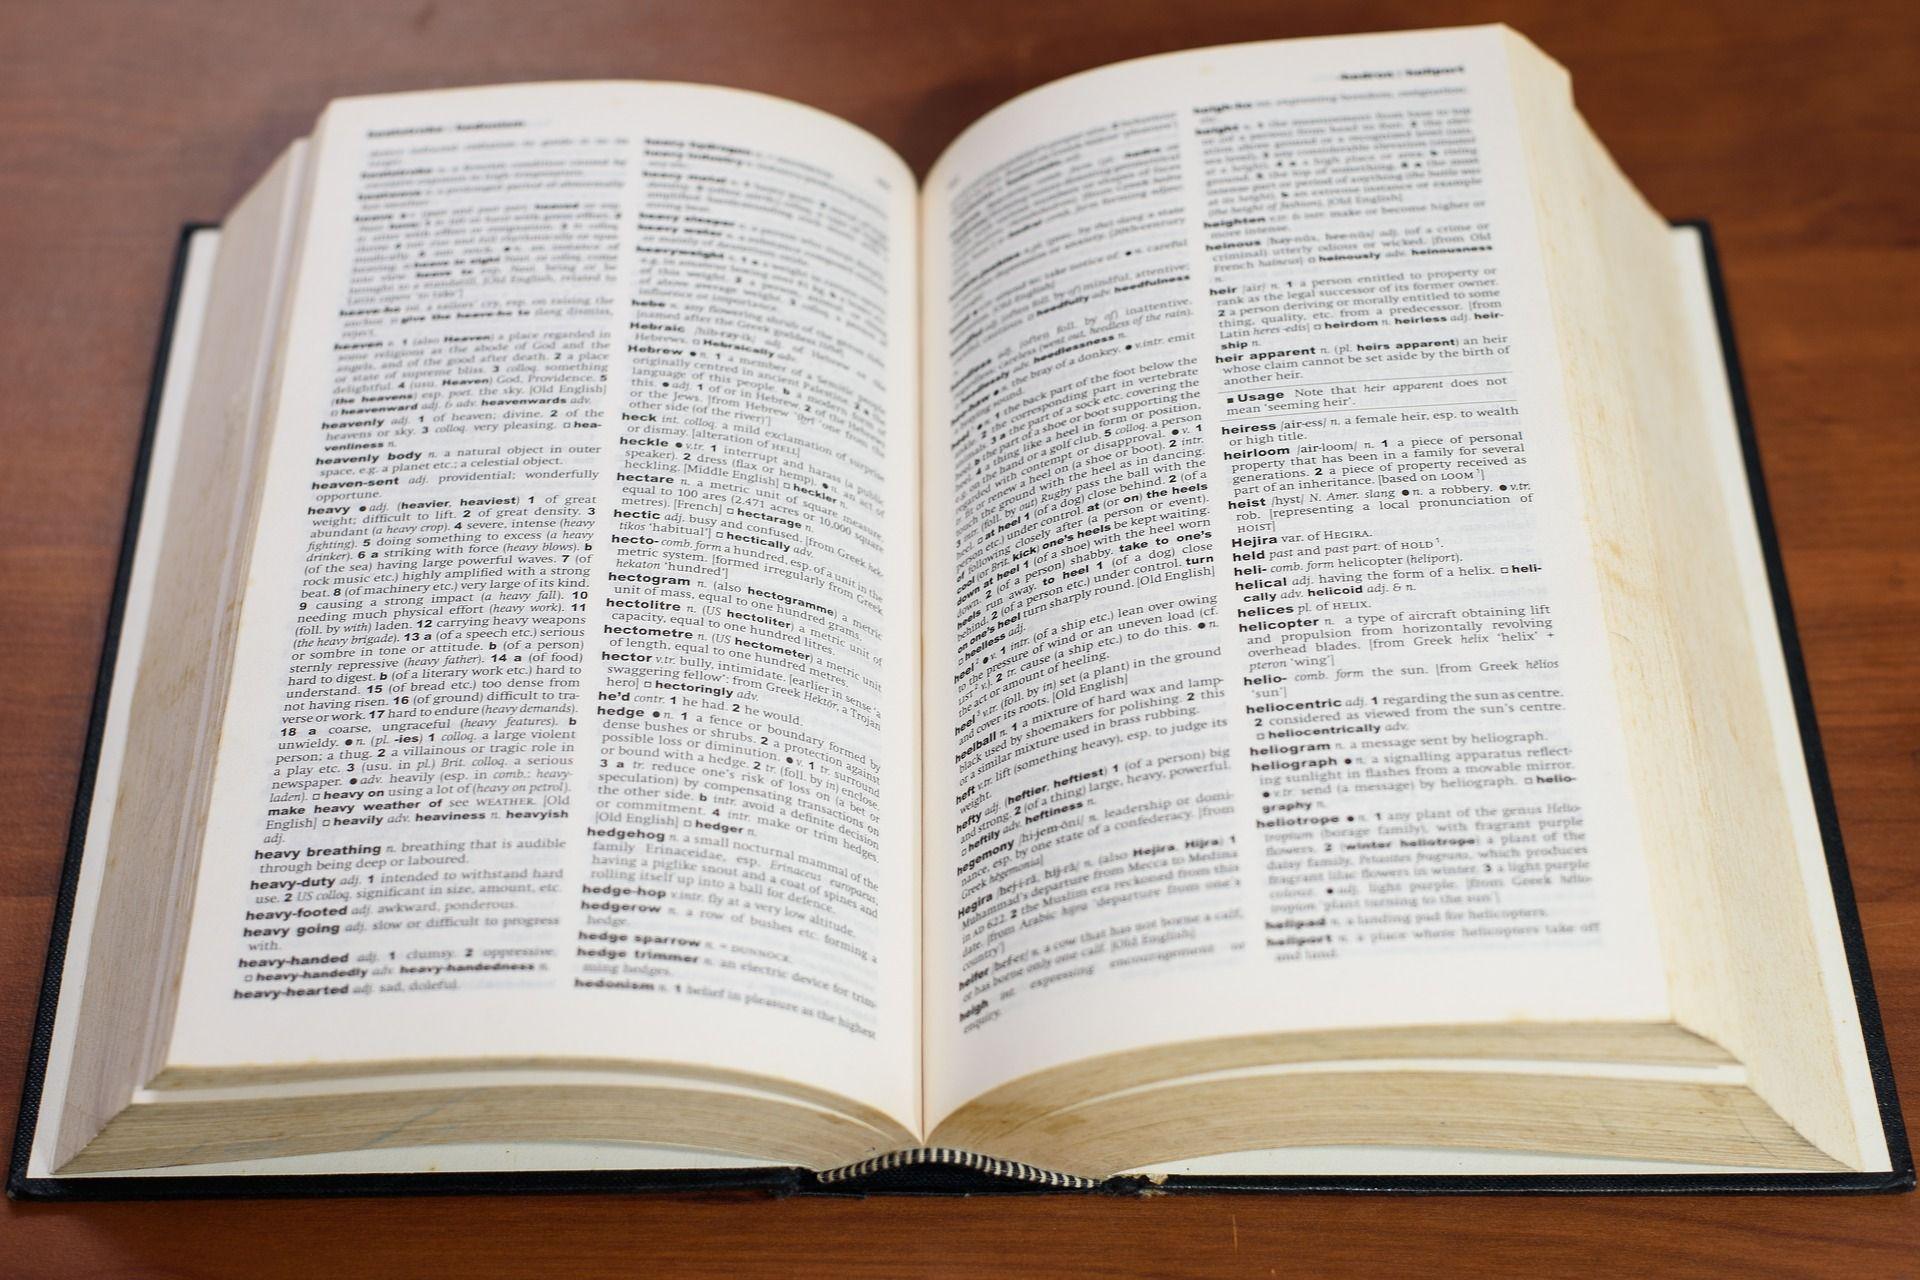 Nieuwe taal leren in lockdown? Wouter spreekt 23 talen!